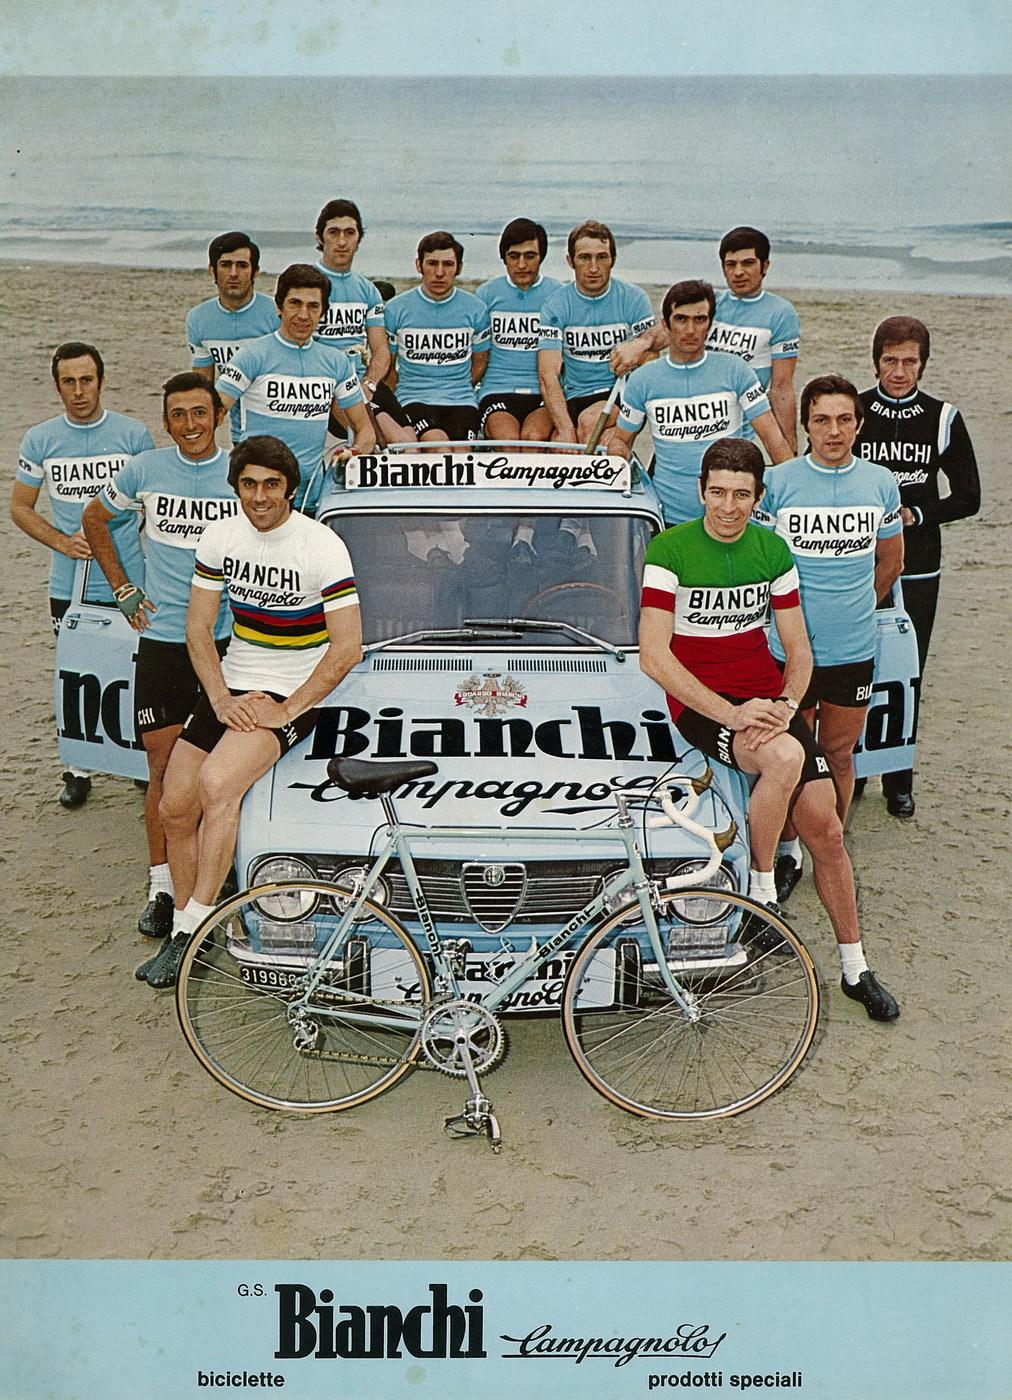 Bianchi Campagnolo 1973